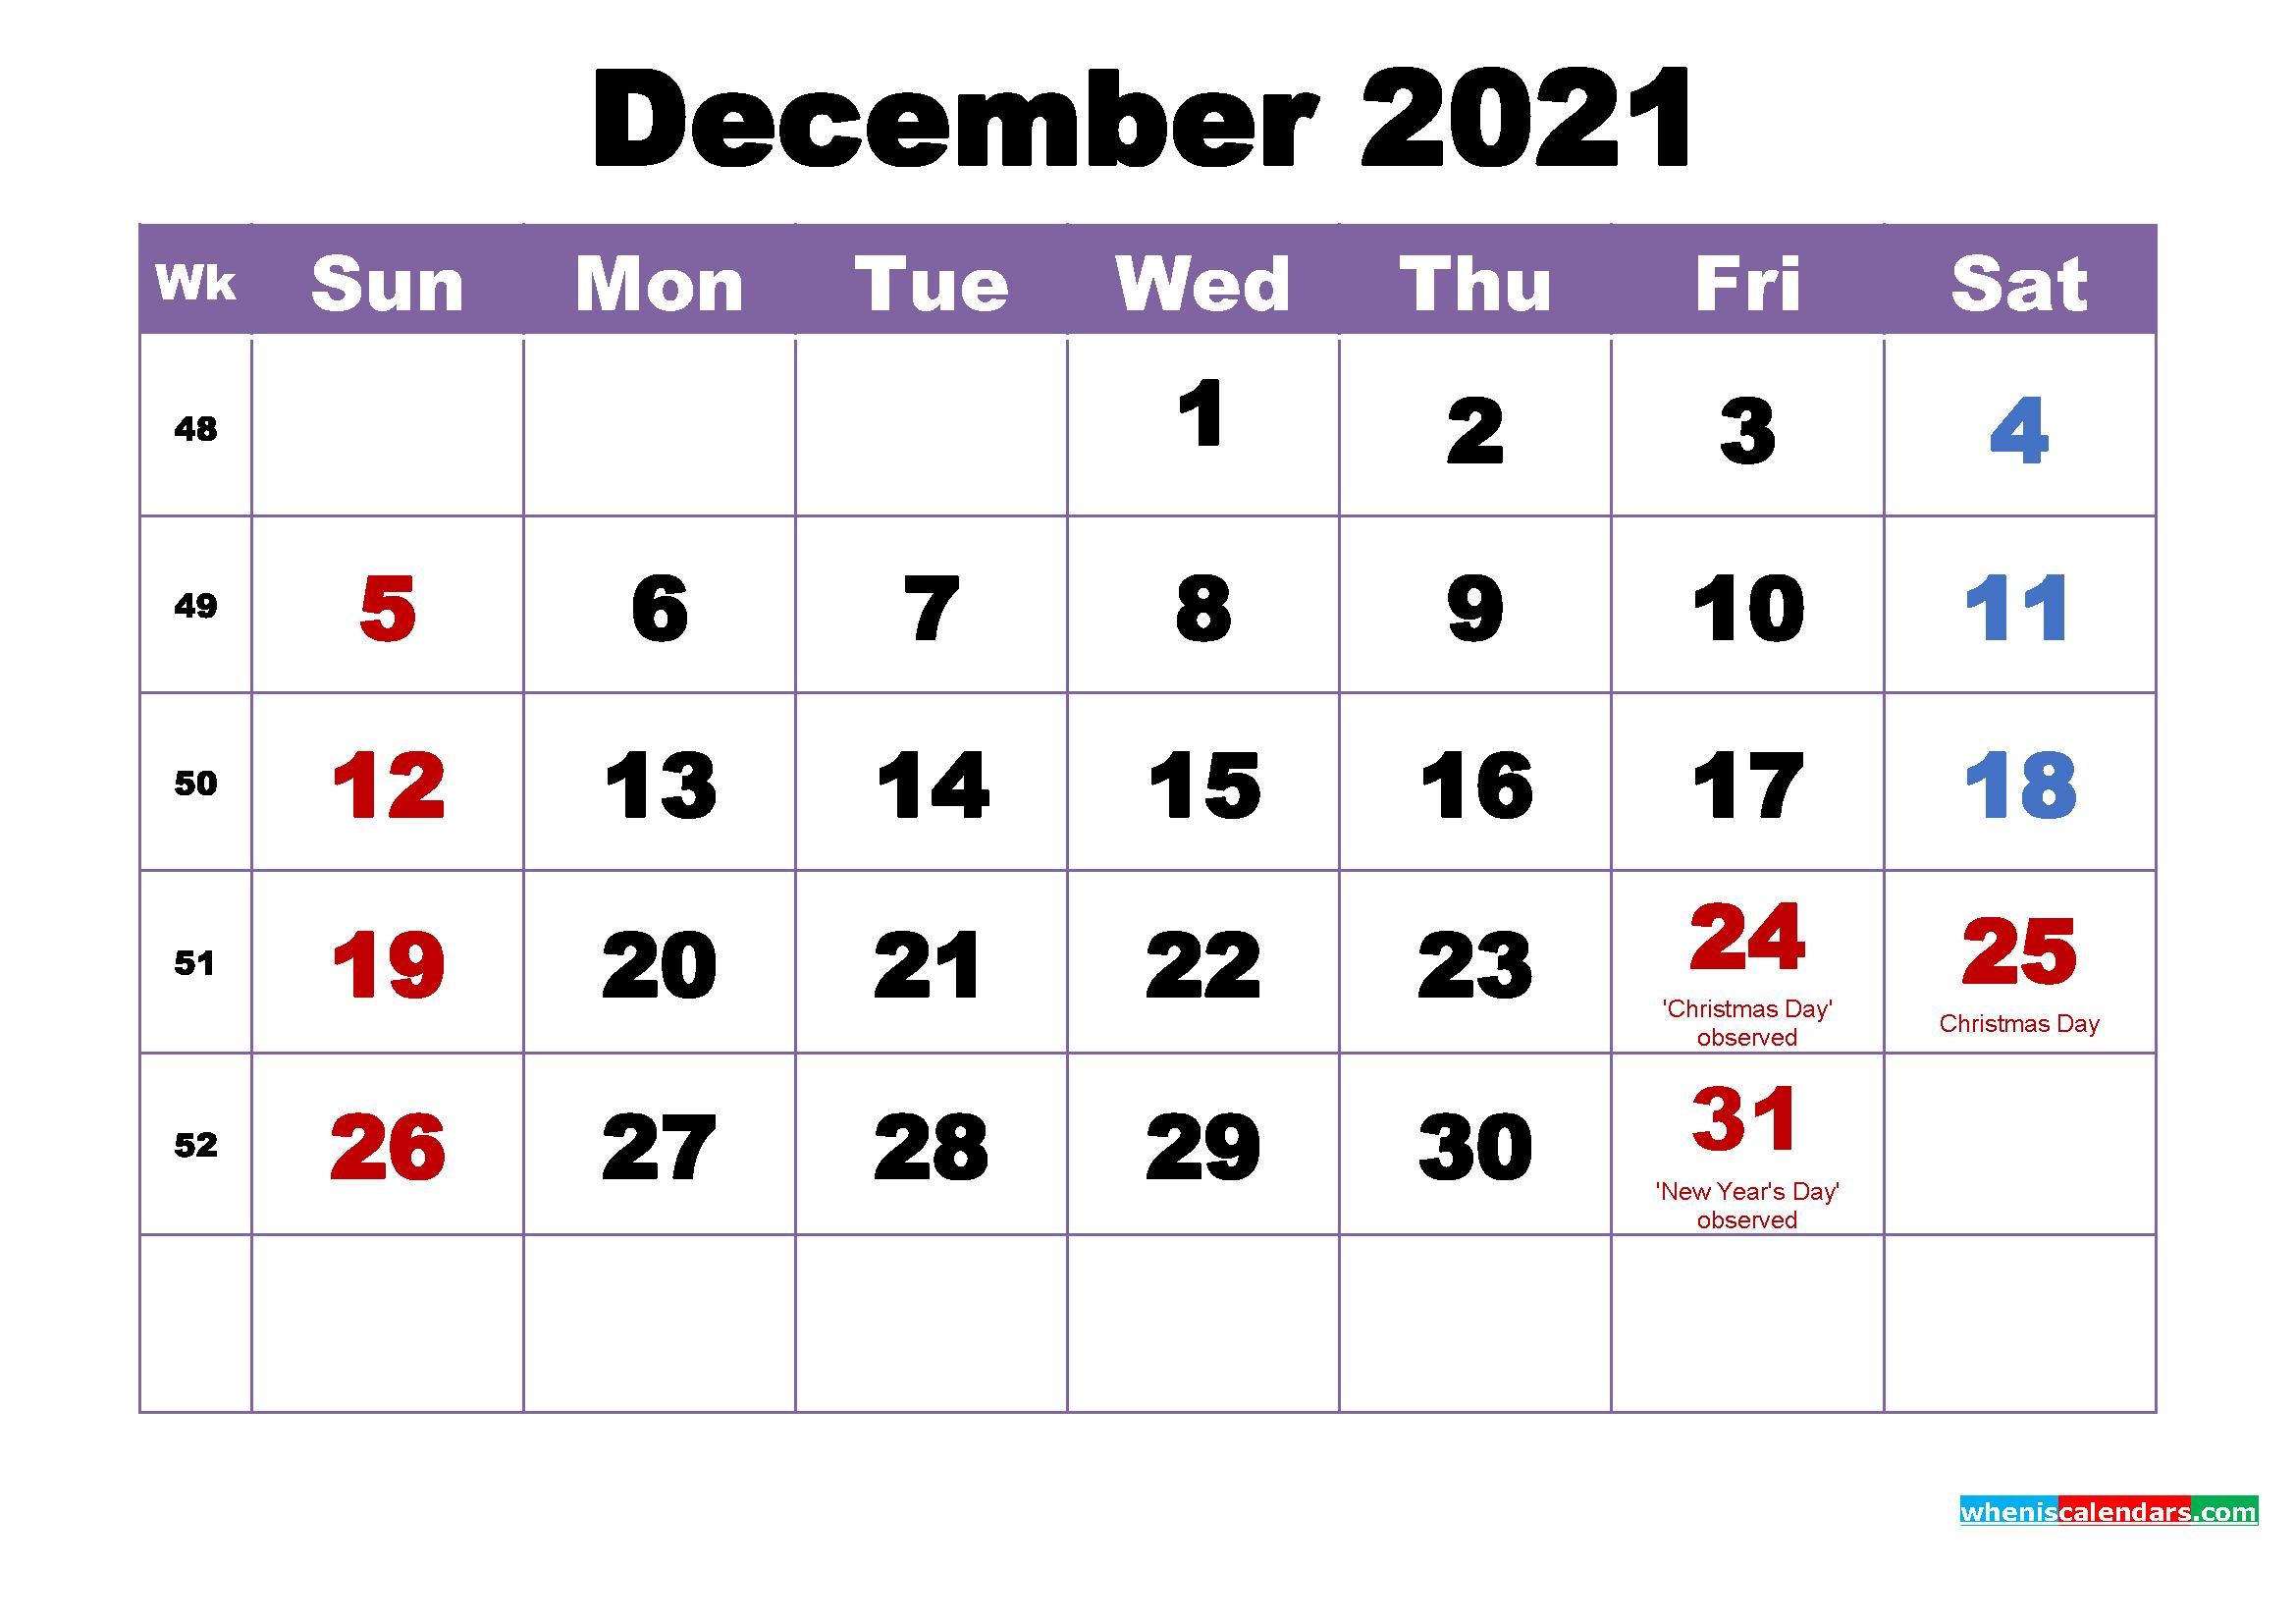 December 2021 Printable Calendar With Holidays Word Pdf